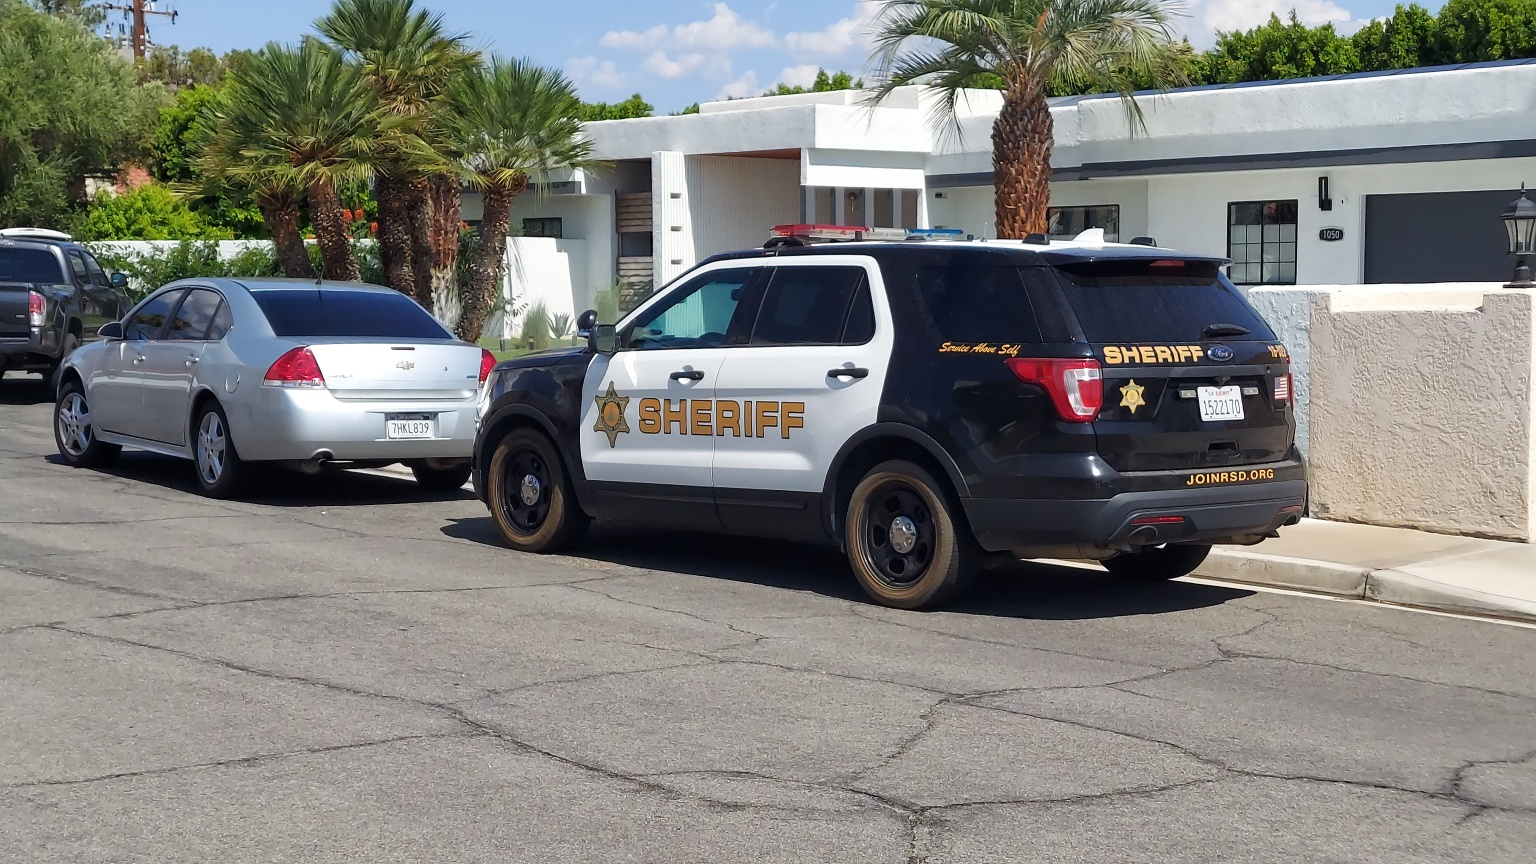 Suspected Drug Dealer, Four Others Arrested During FBI Raid in Palm Springs